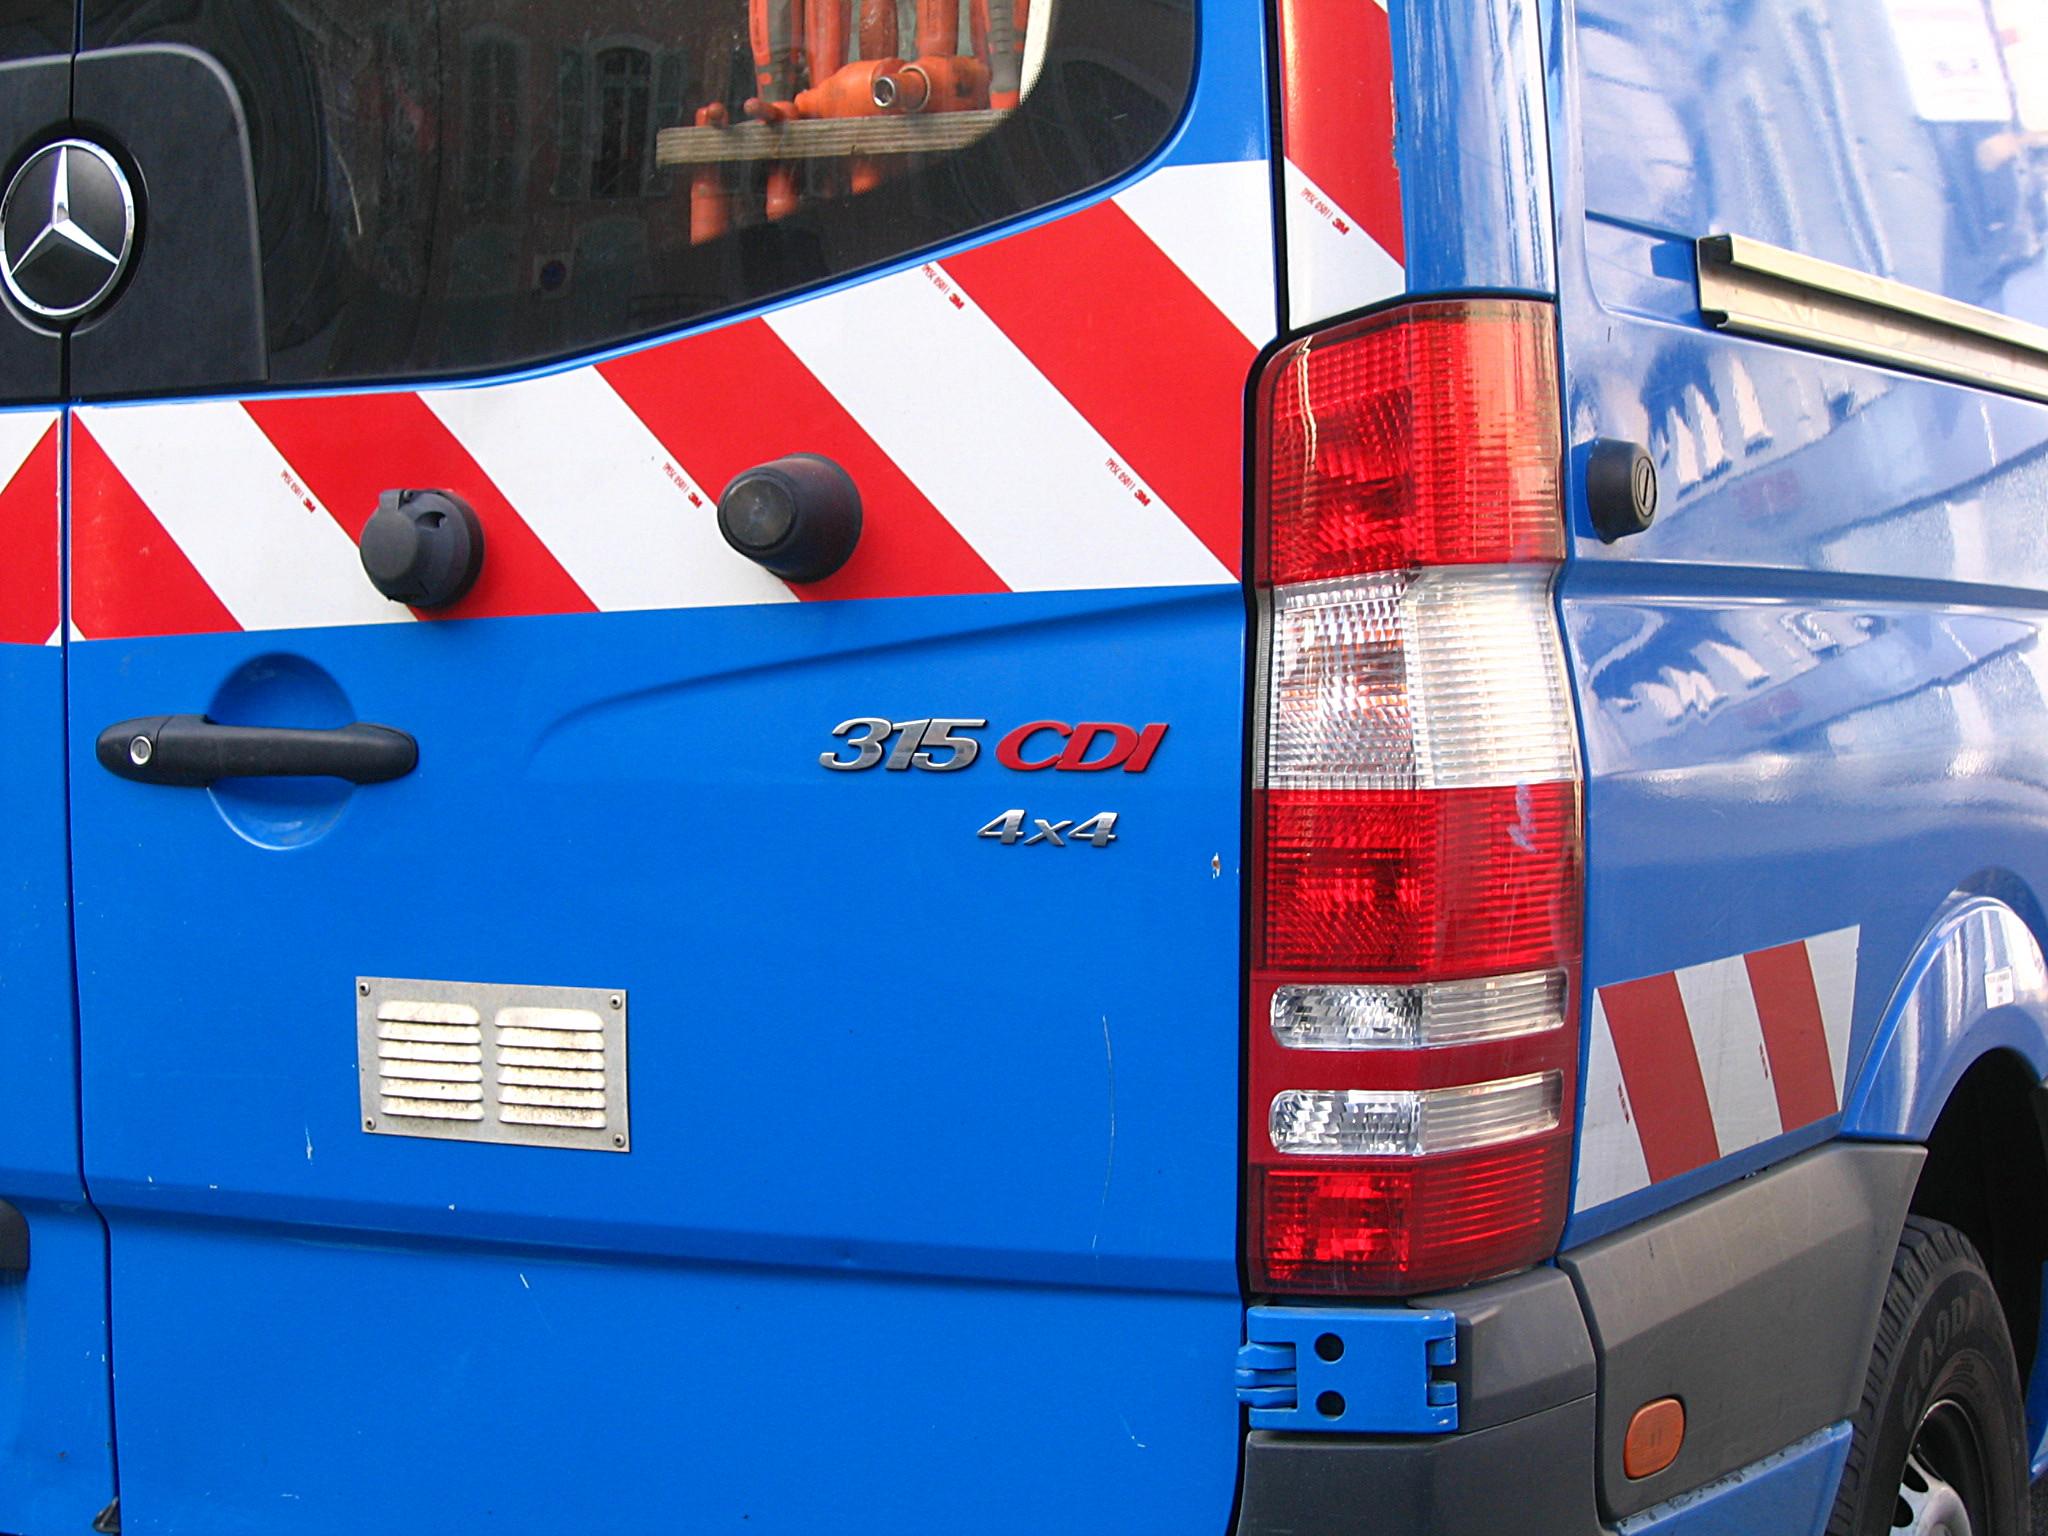 file200614 4wd mercedesbenz sprinter logojpg